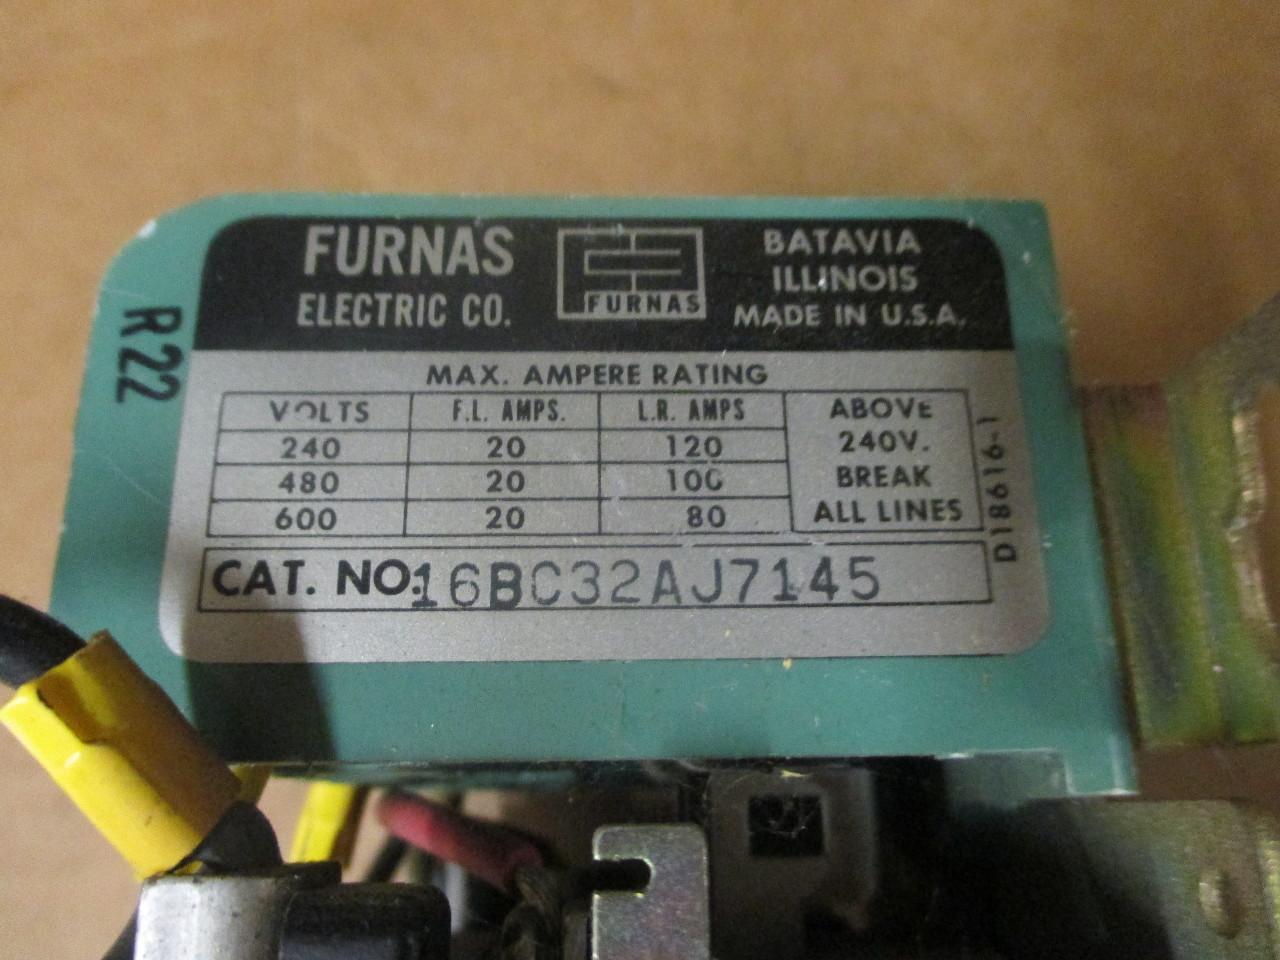 FURNAS ELECTRIC CO 16BC32AJ7145 Starter